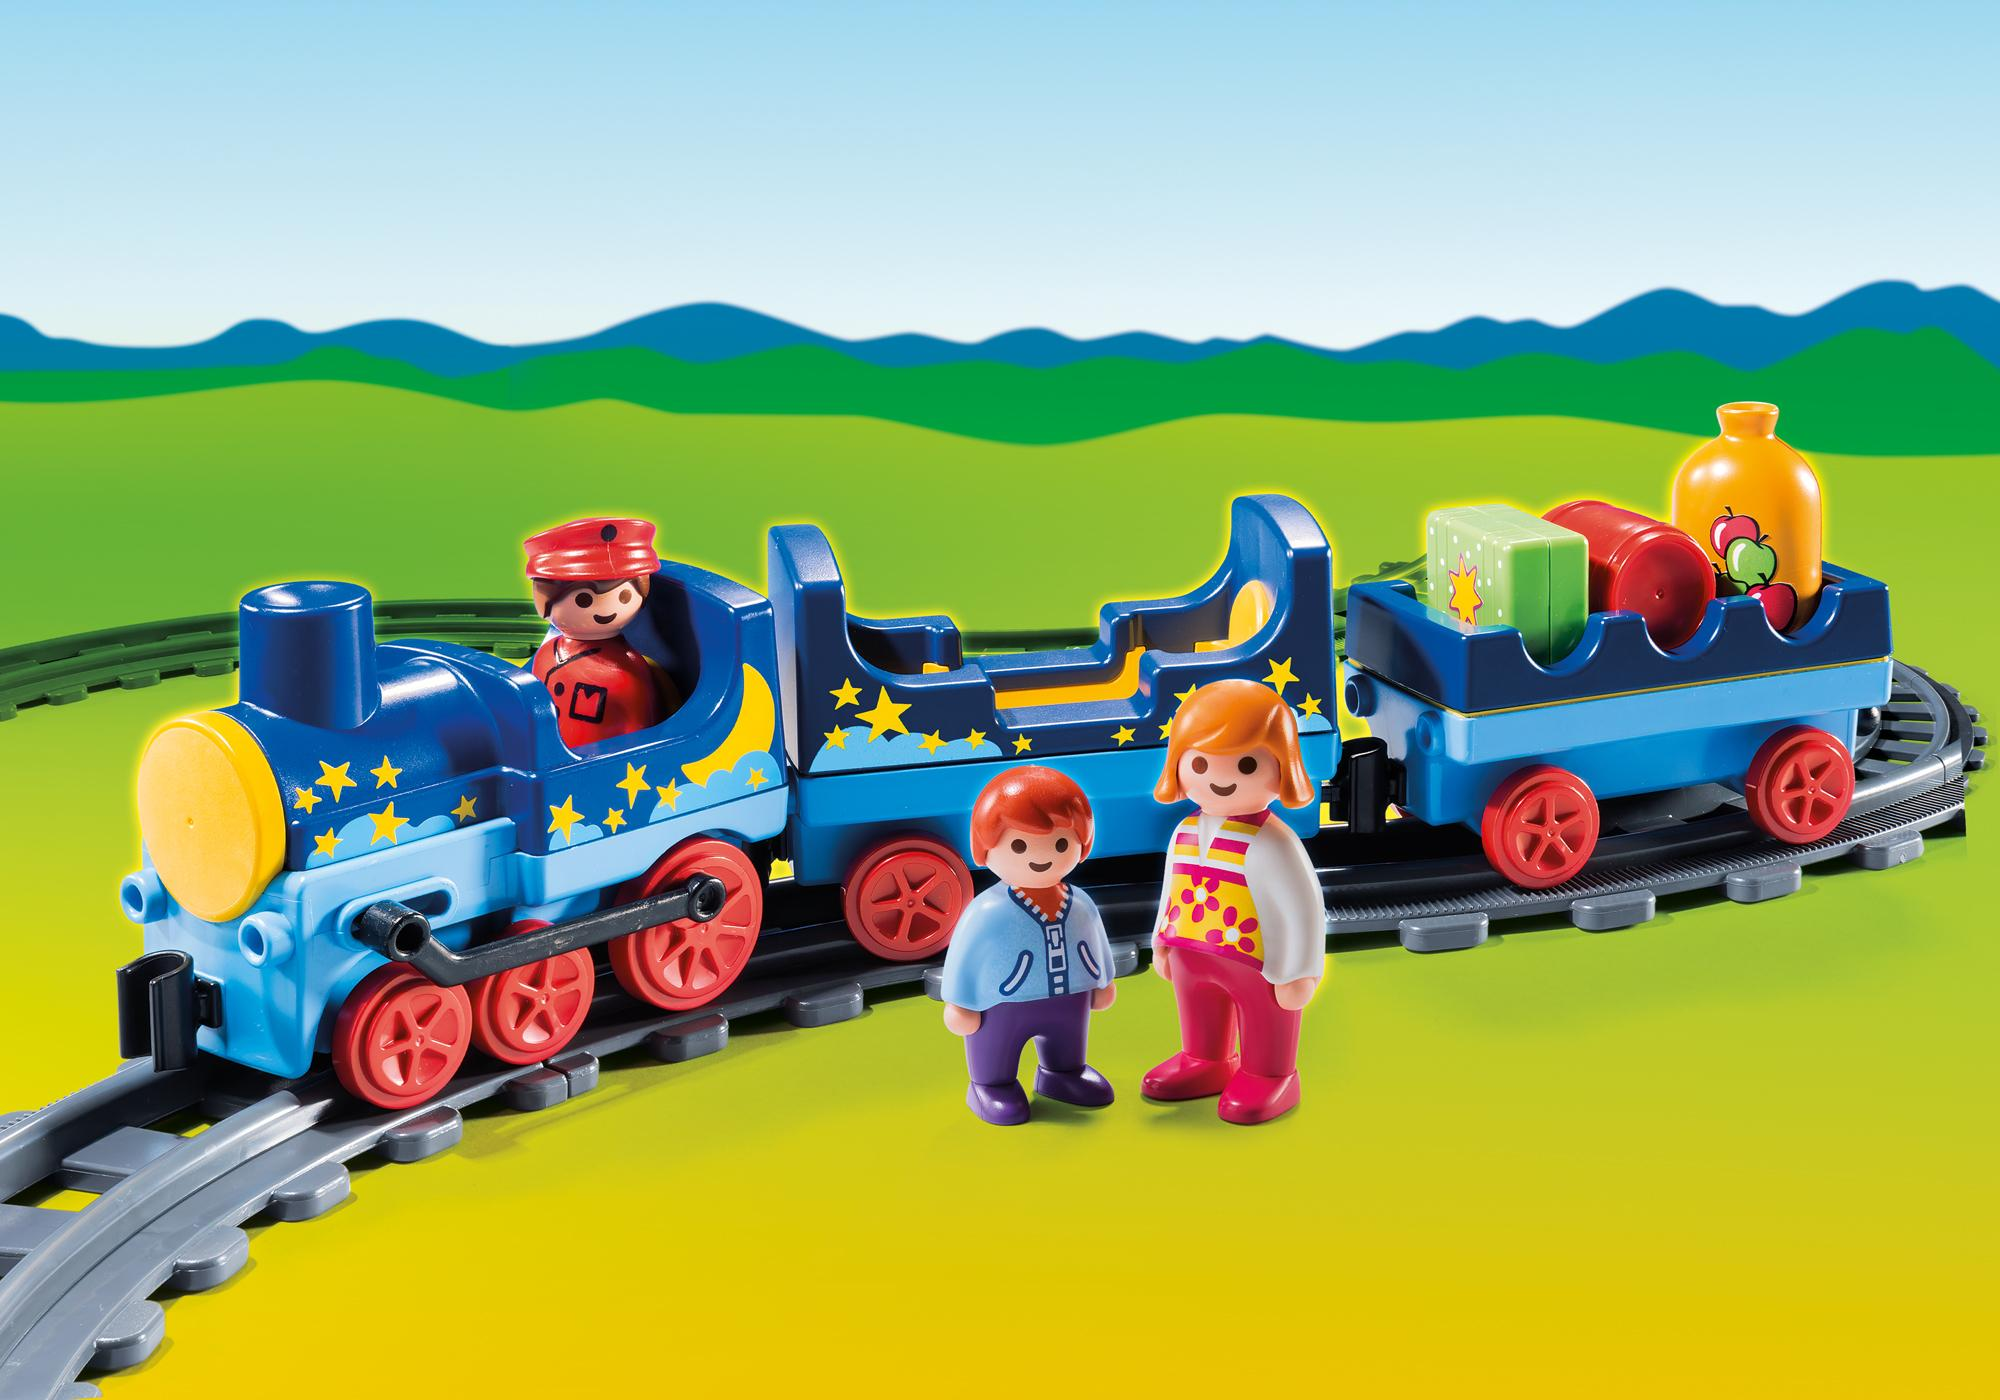 http://media.playmobil.com/i/playmobil/6880_product_detail/Train étoilé avec passagers et rails